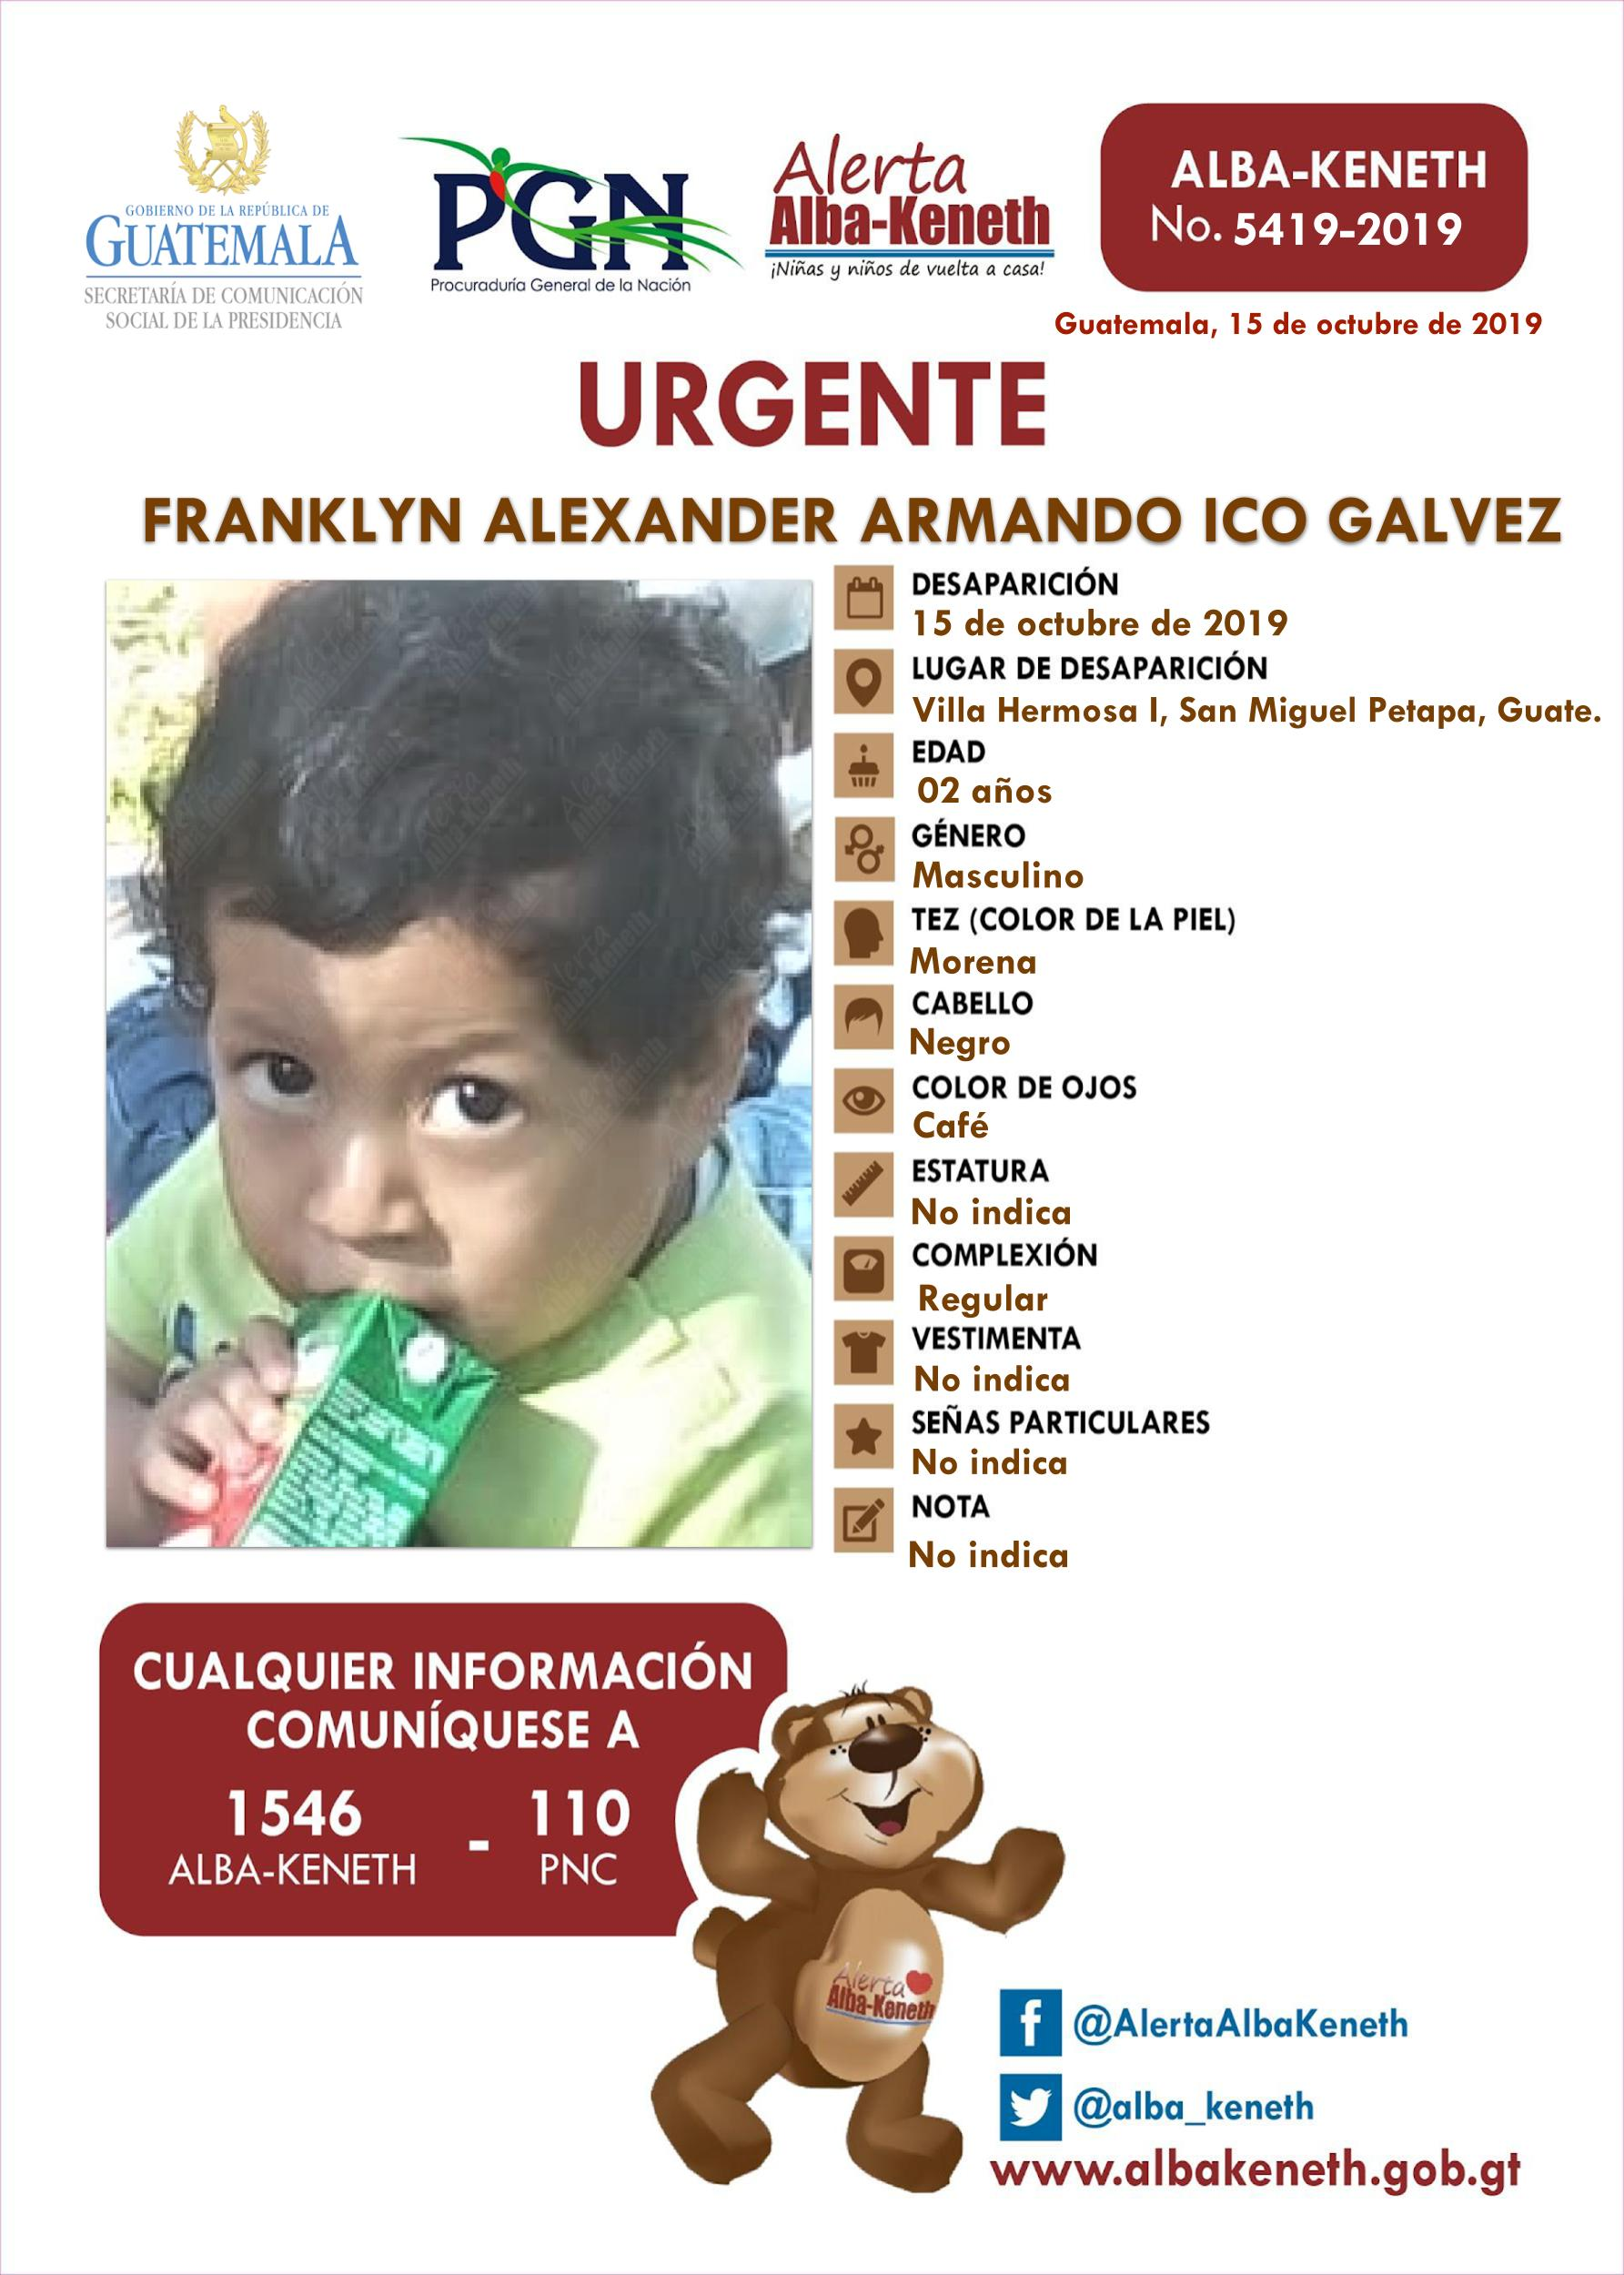 Franklyn Alexander Armando Ico Galvez